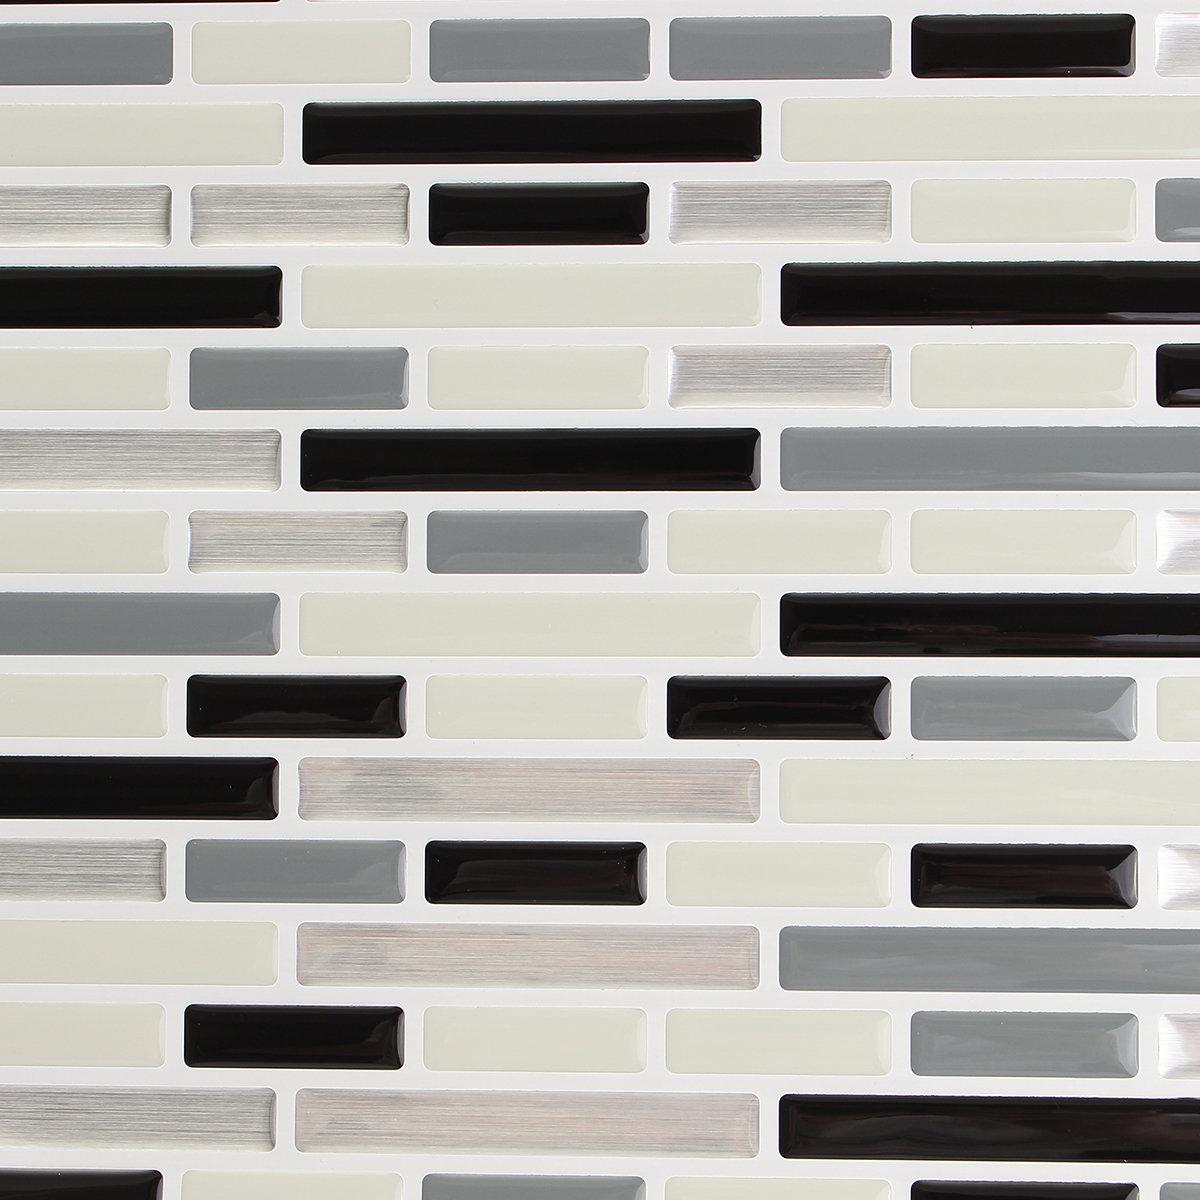 Grey Creative 3D Mosaic Wall Stickers Backsplash Tile Wallpaper Home Bathroom Kitchen Decor